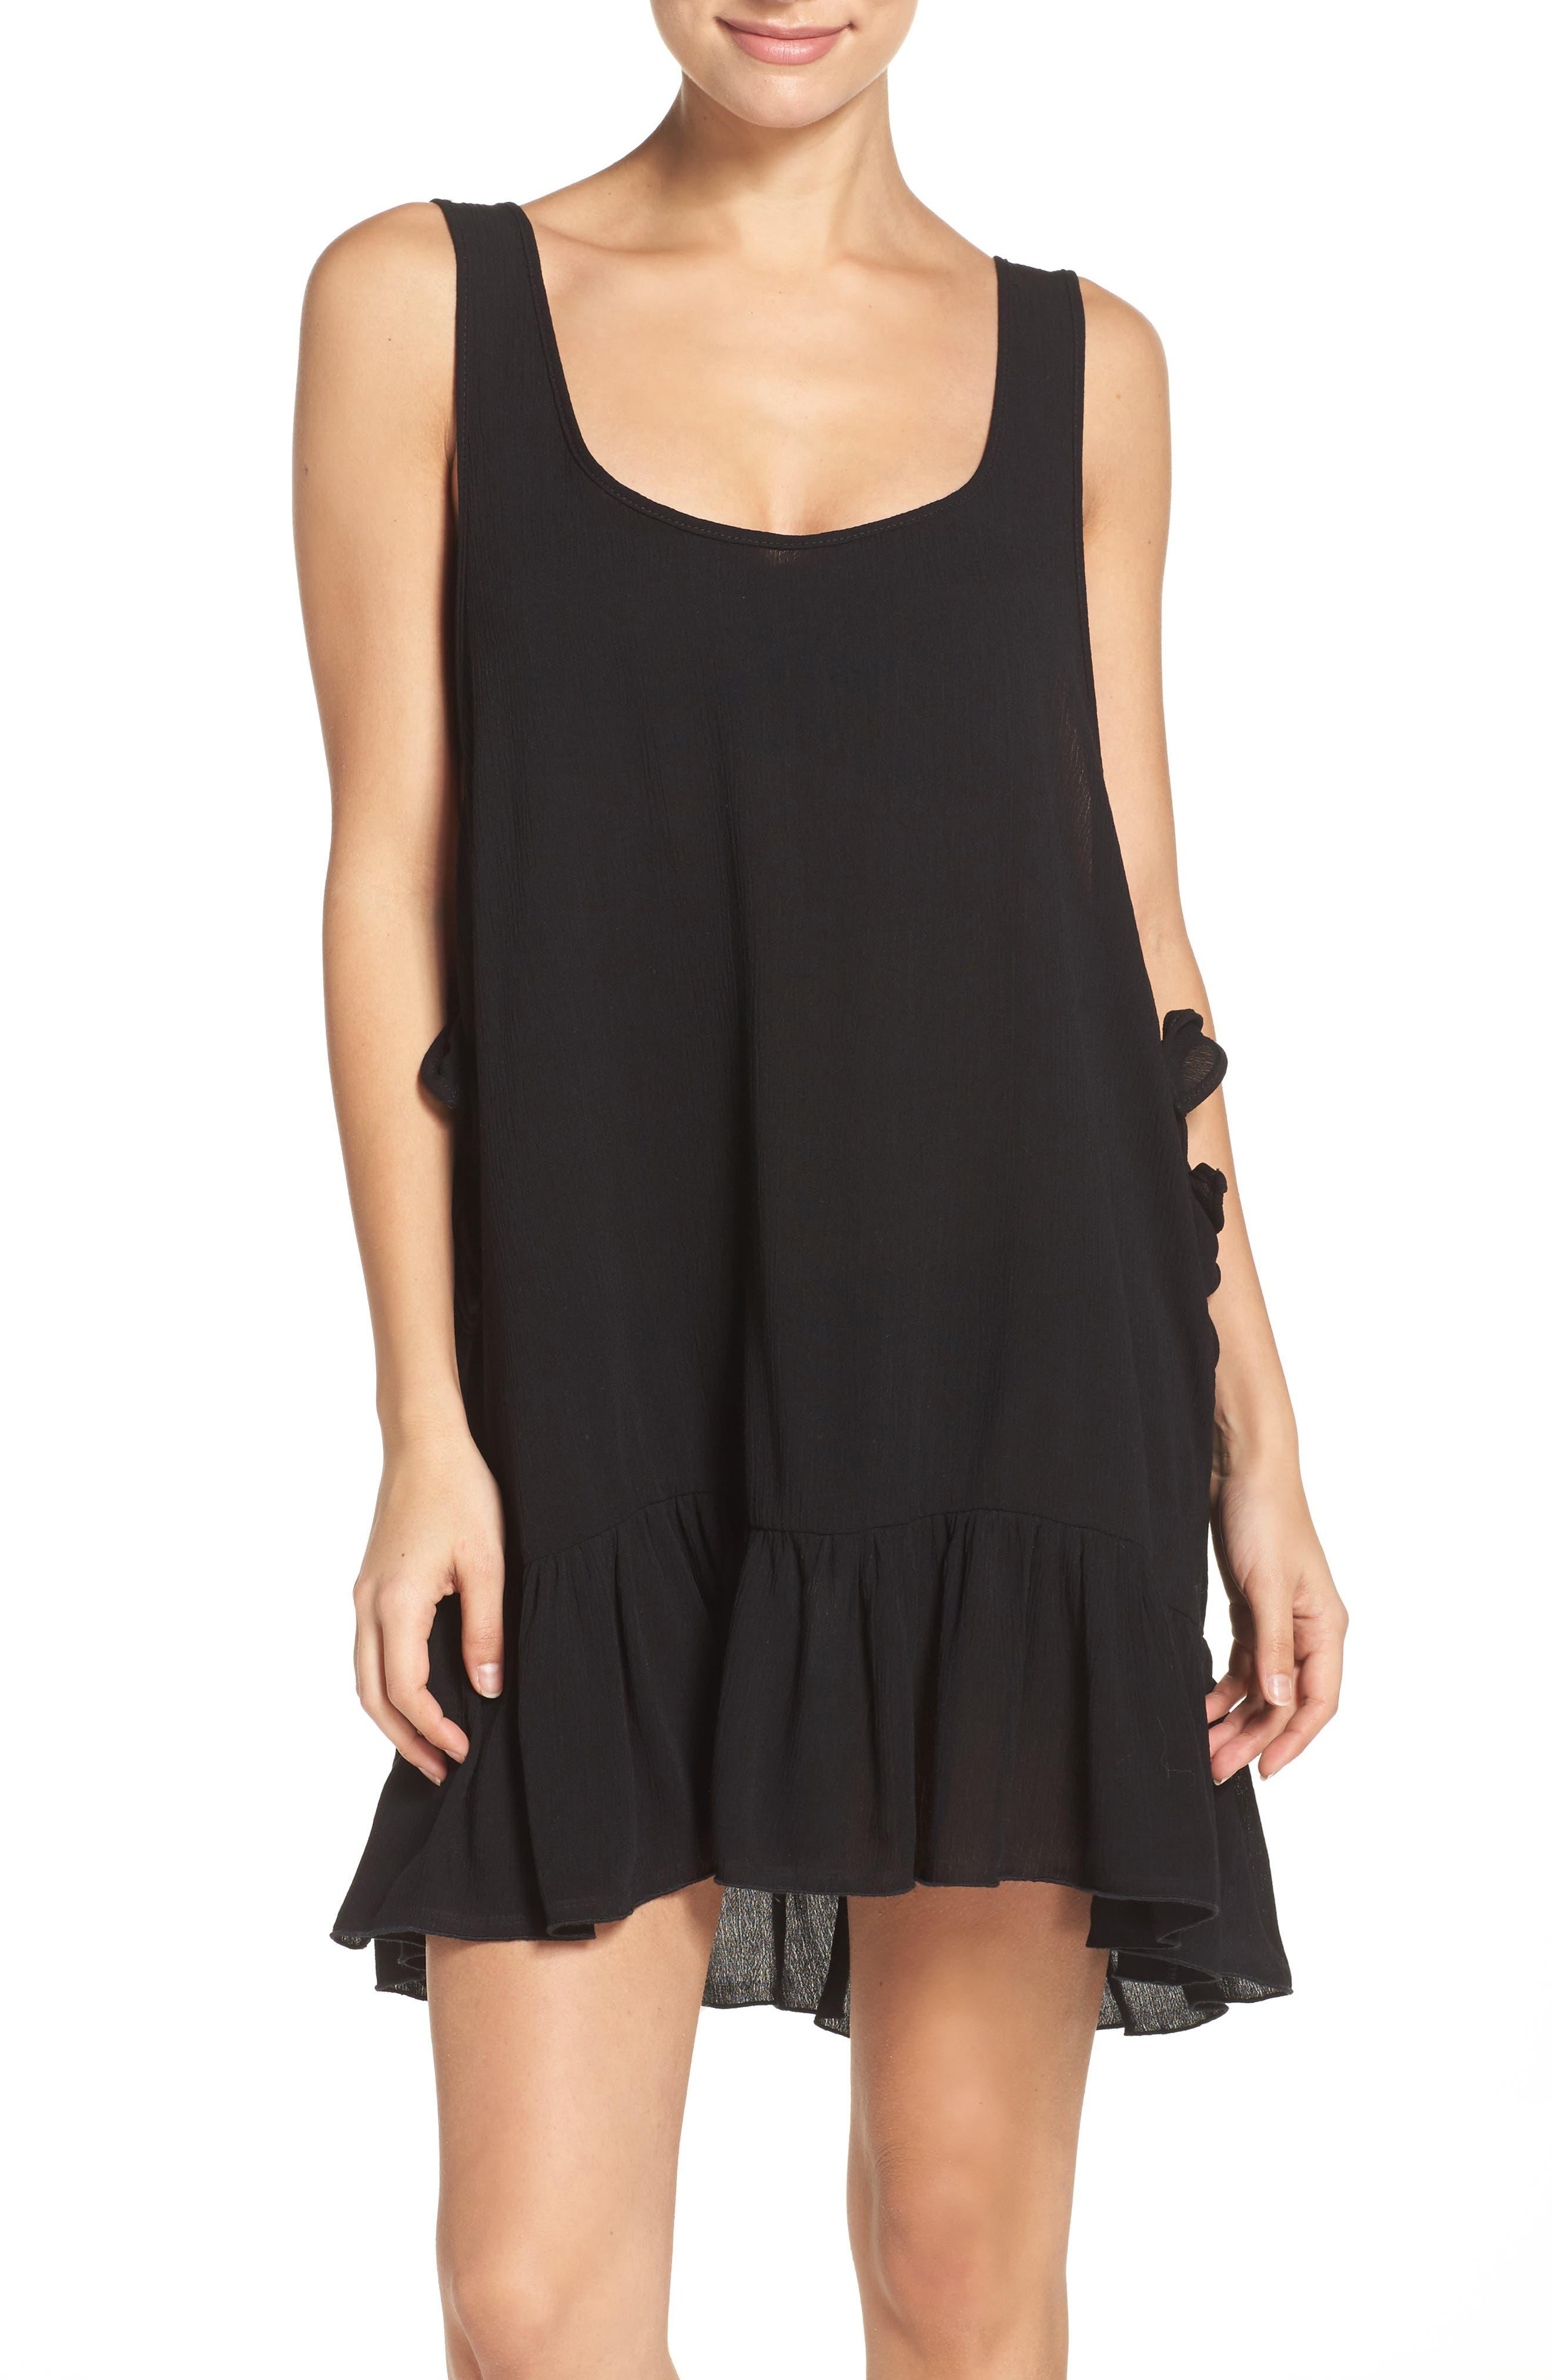 ELAN Side Tie Cover-Up Dress, Main, color, 001